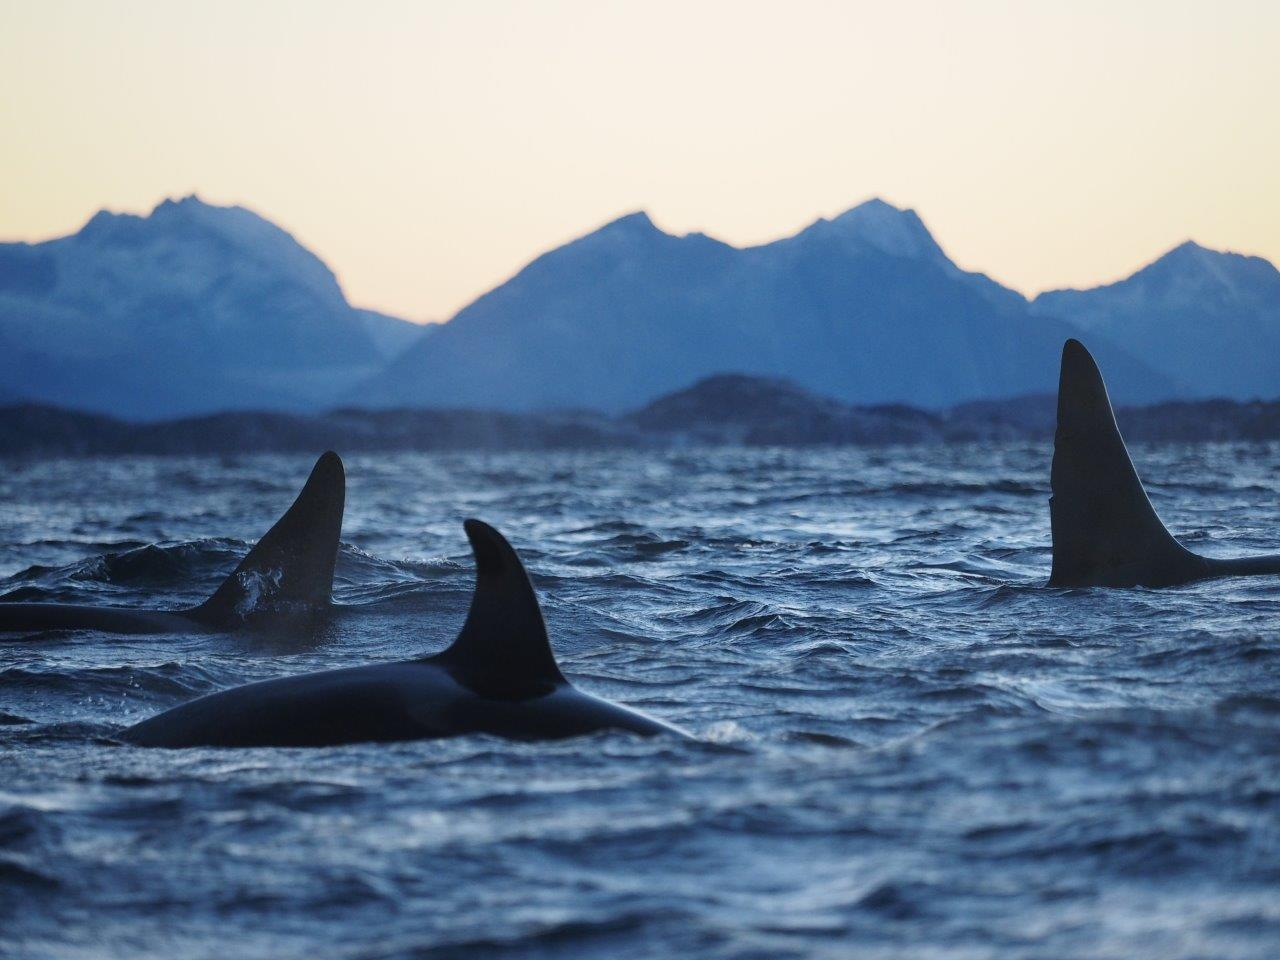 Zeilreis Noord-Noorwegen: Aurora Borealis & Walvissen